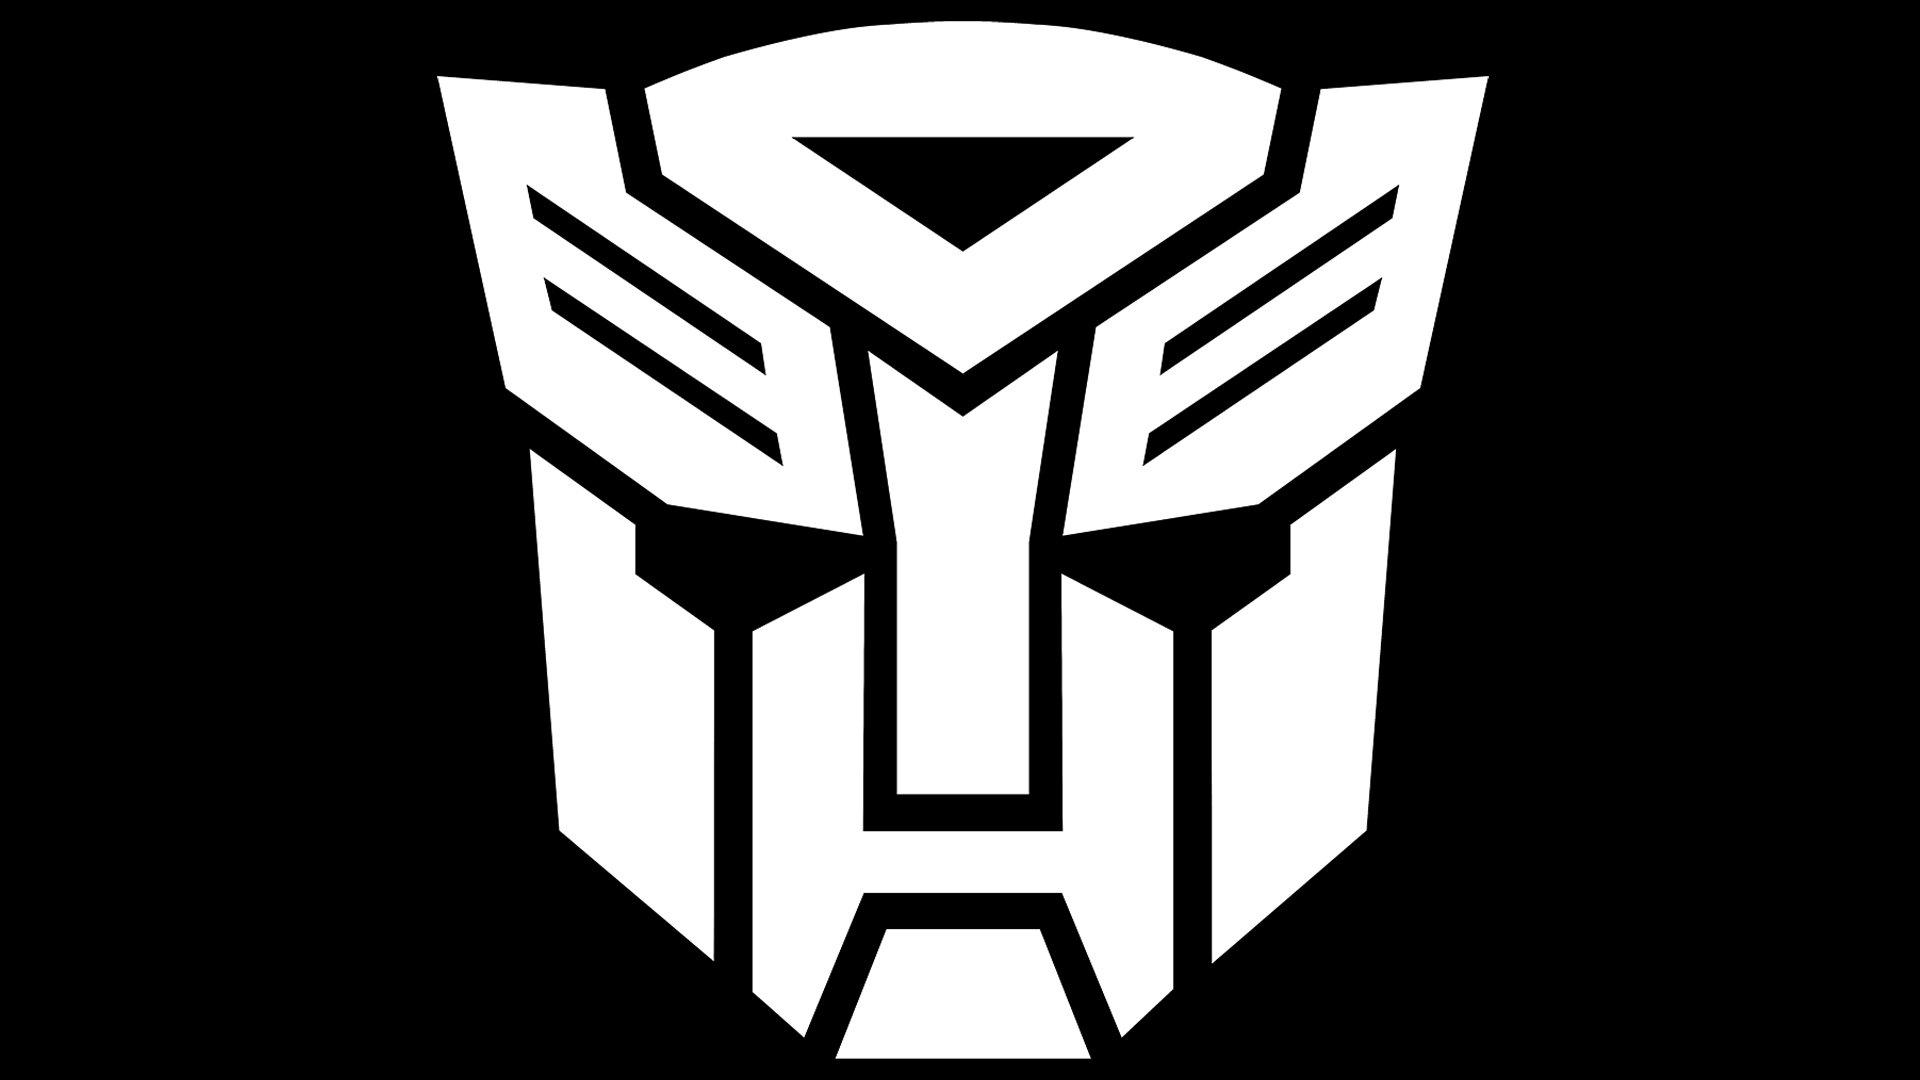 autobots logo autobots symbol meaning history and evolution